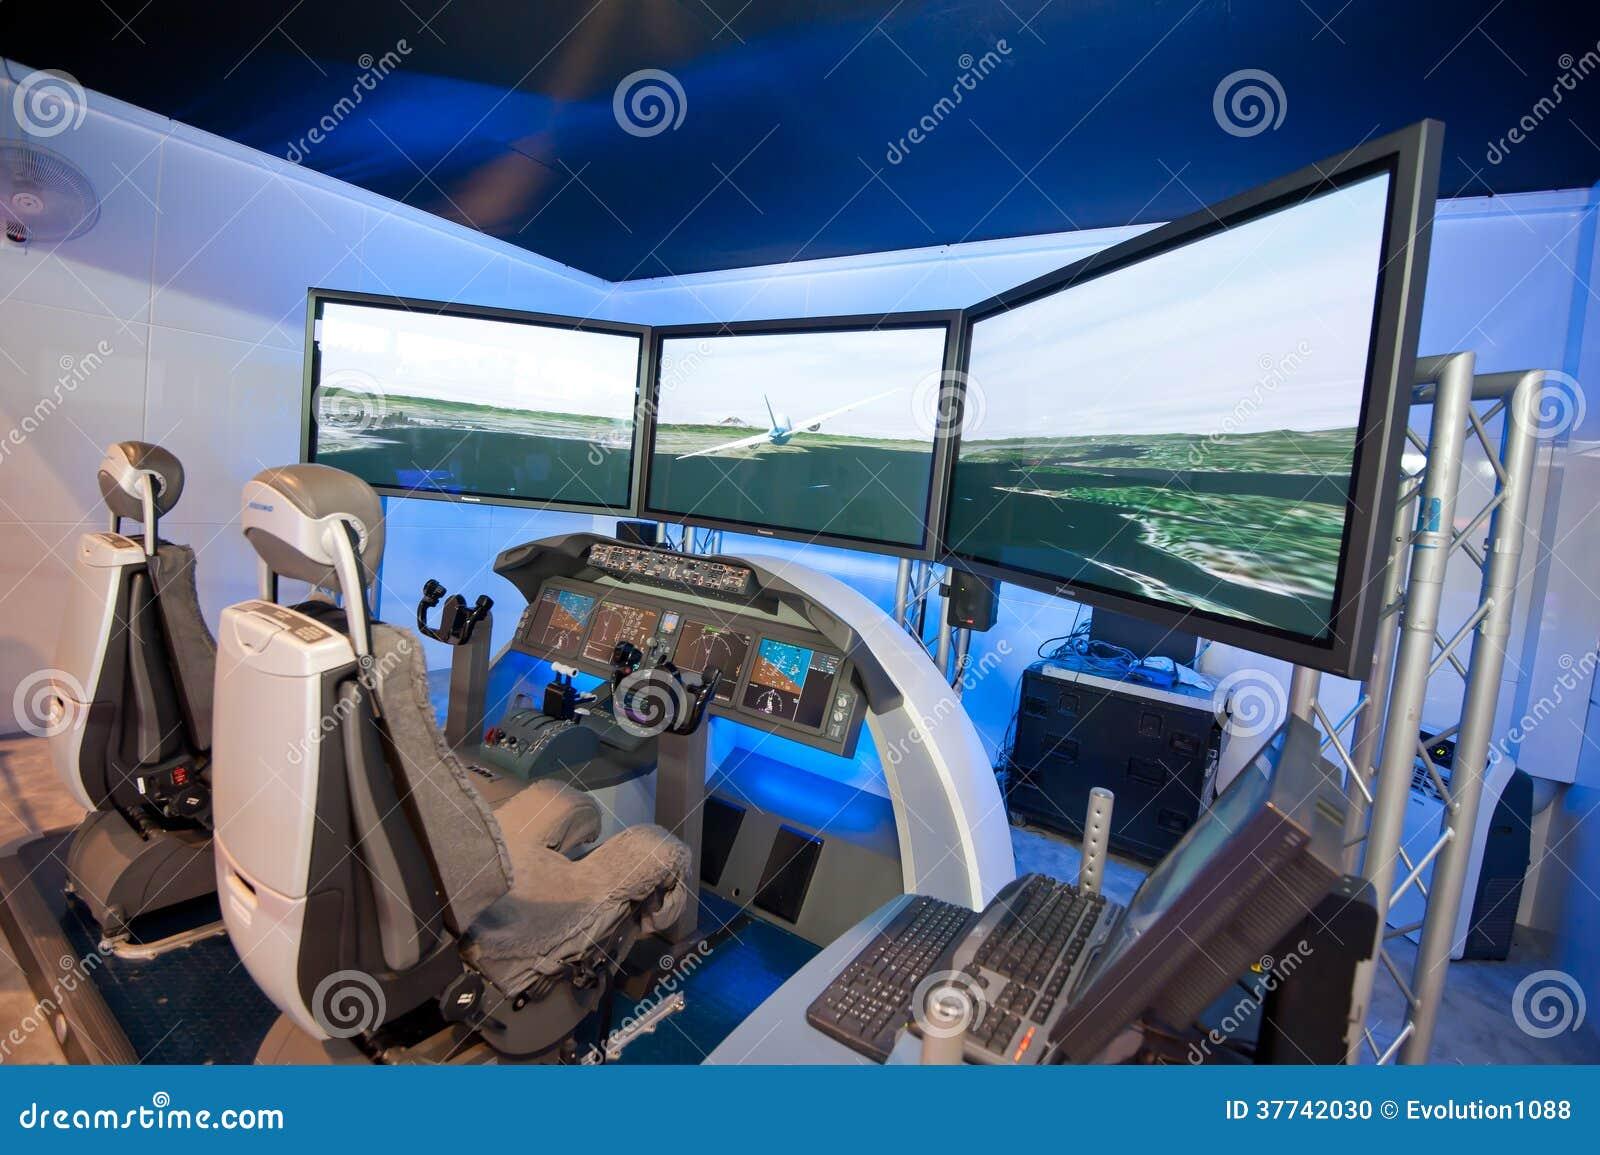 Boeing 787 Dreamliner Flight Simulator At Singapore Airshow 2014